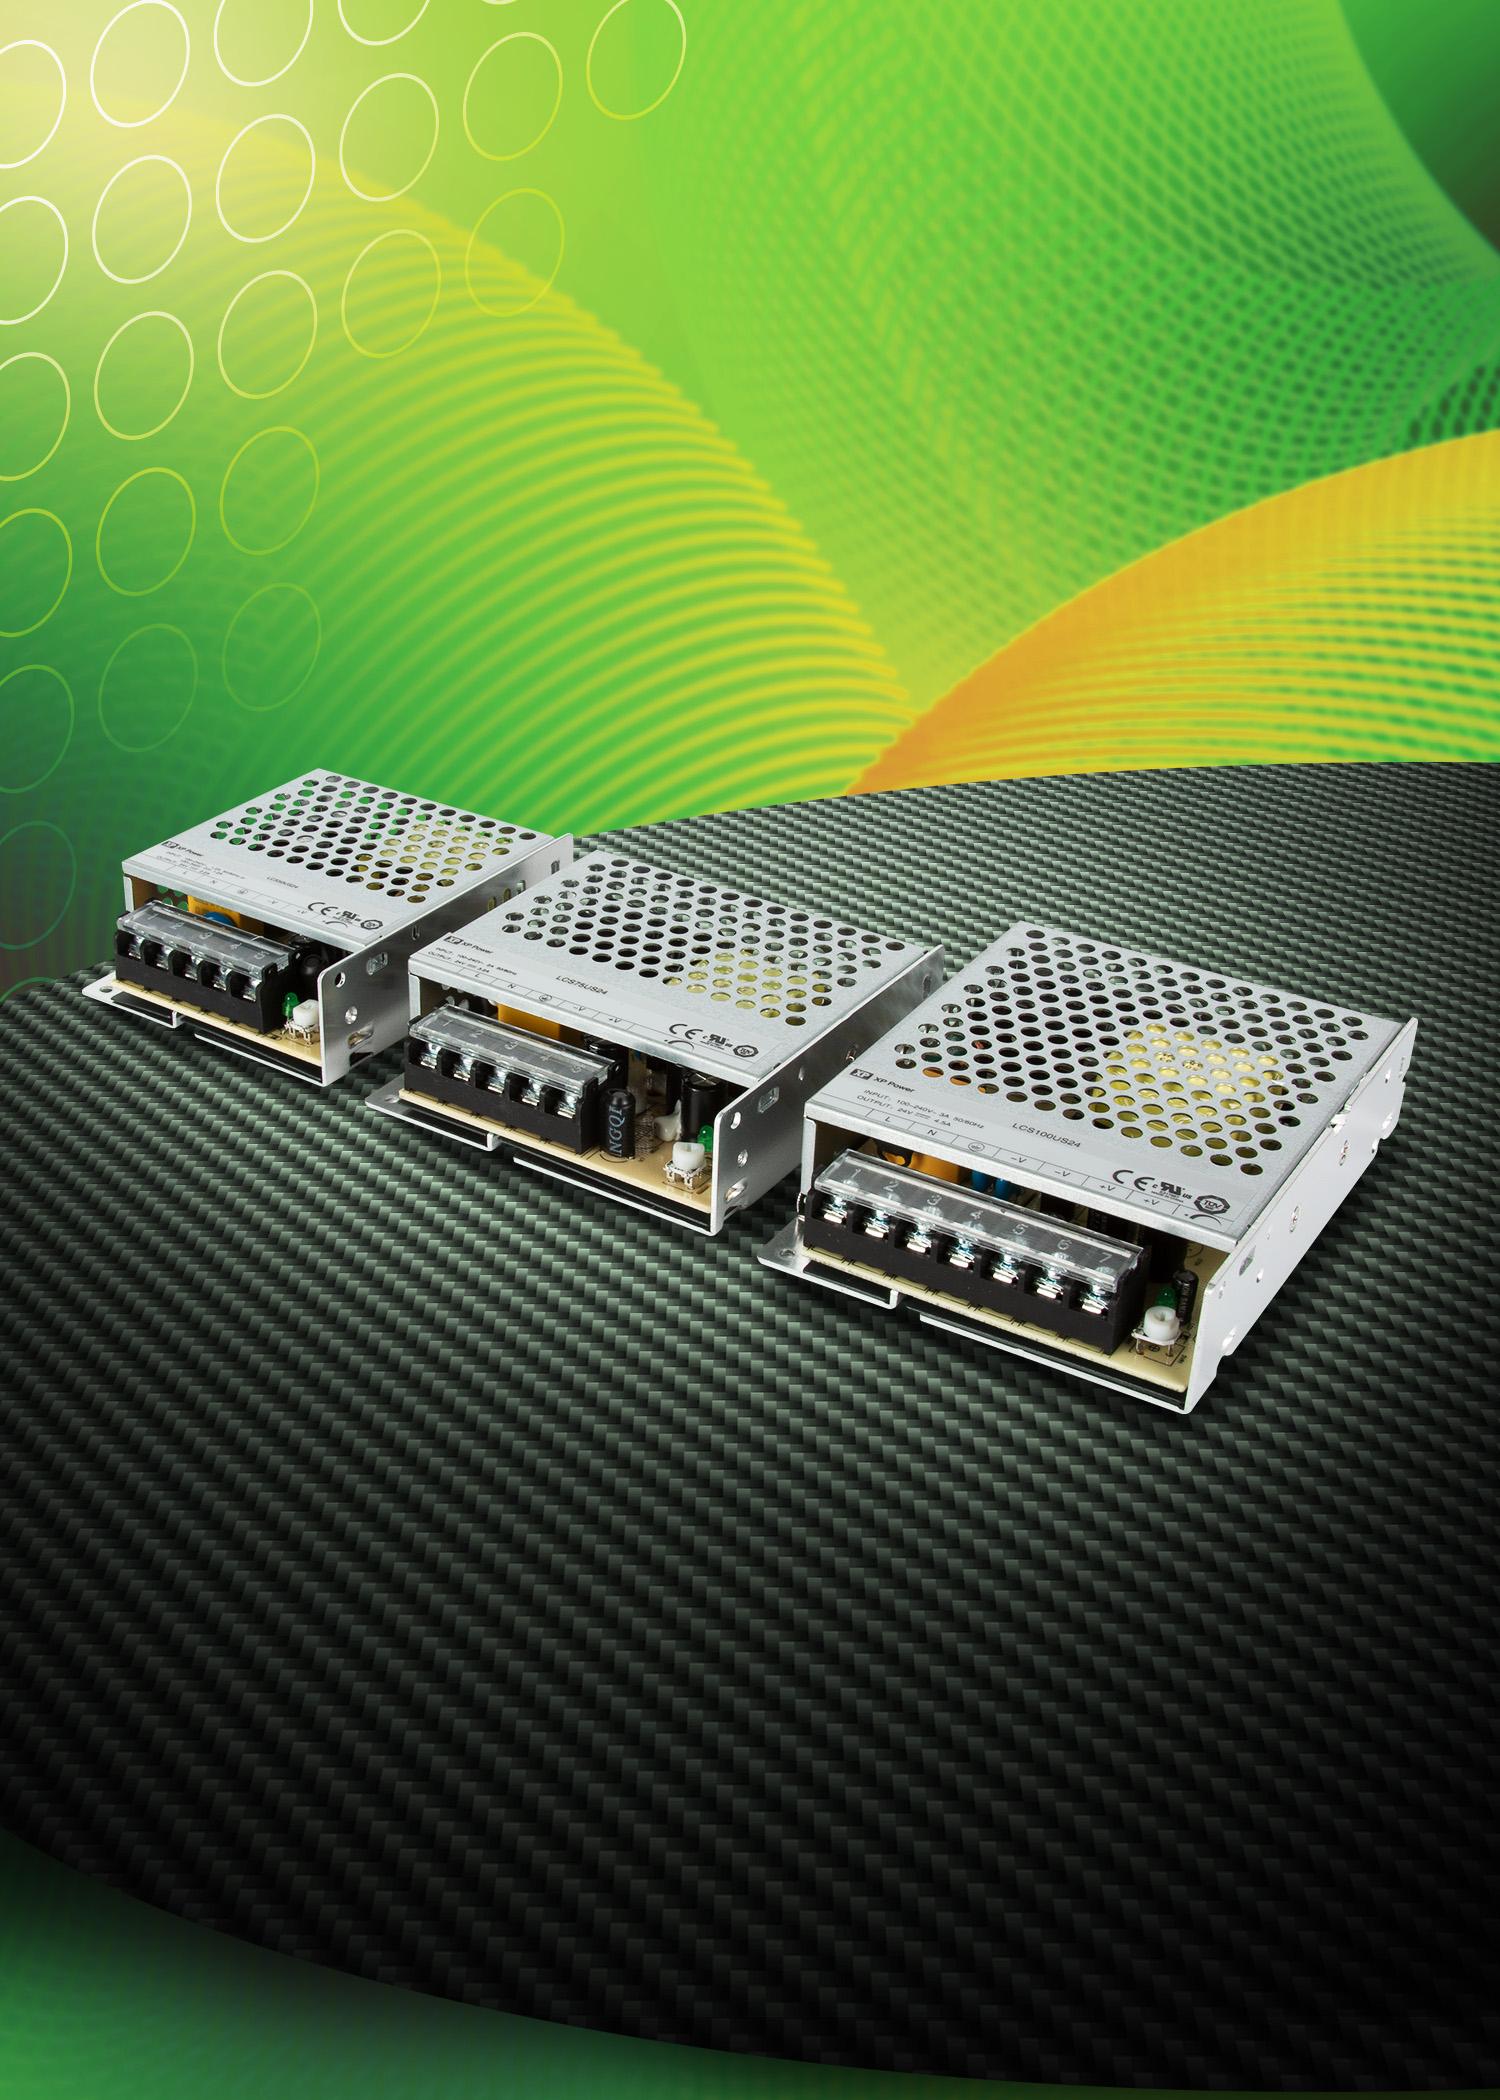 XP Power新款价格优惠的封闭型AC-DC电源,额定功率为35W至100W